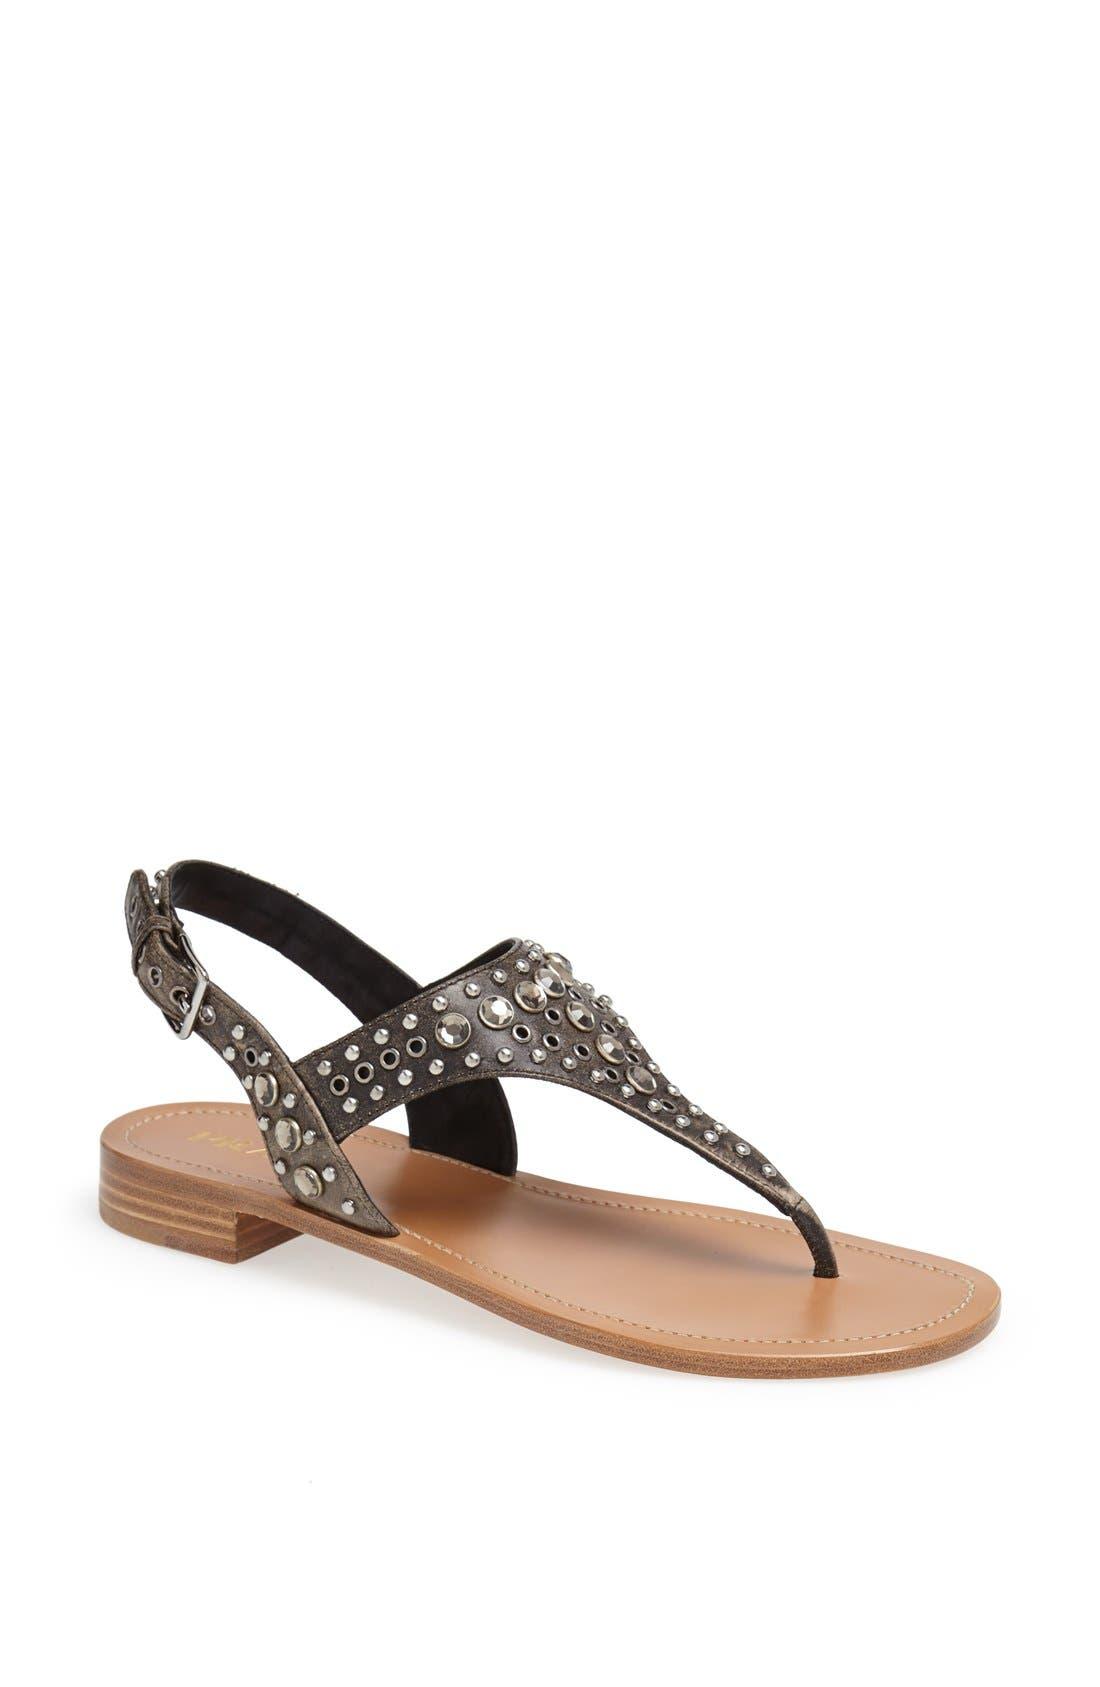 Alternate Image 1 Selected - Prada Studded Sandal